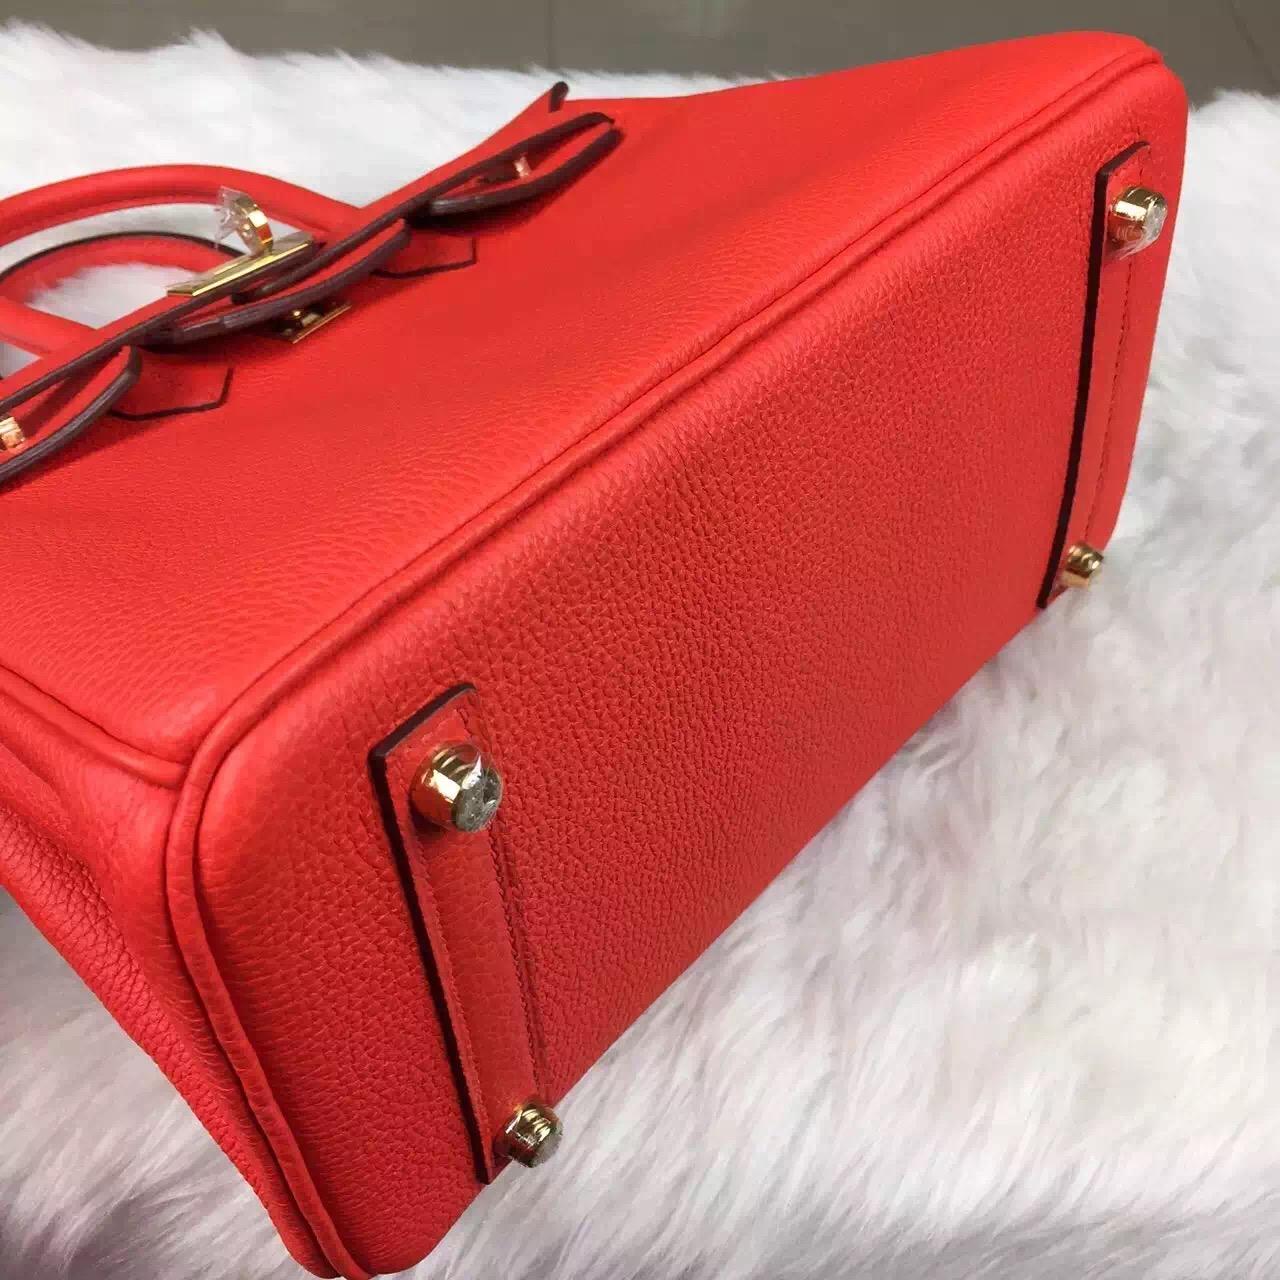 New Pretty Hermes German Calfskin Leather Birkin Bag25cm Flame Red